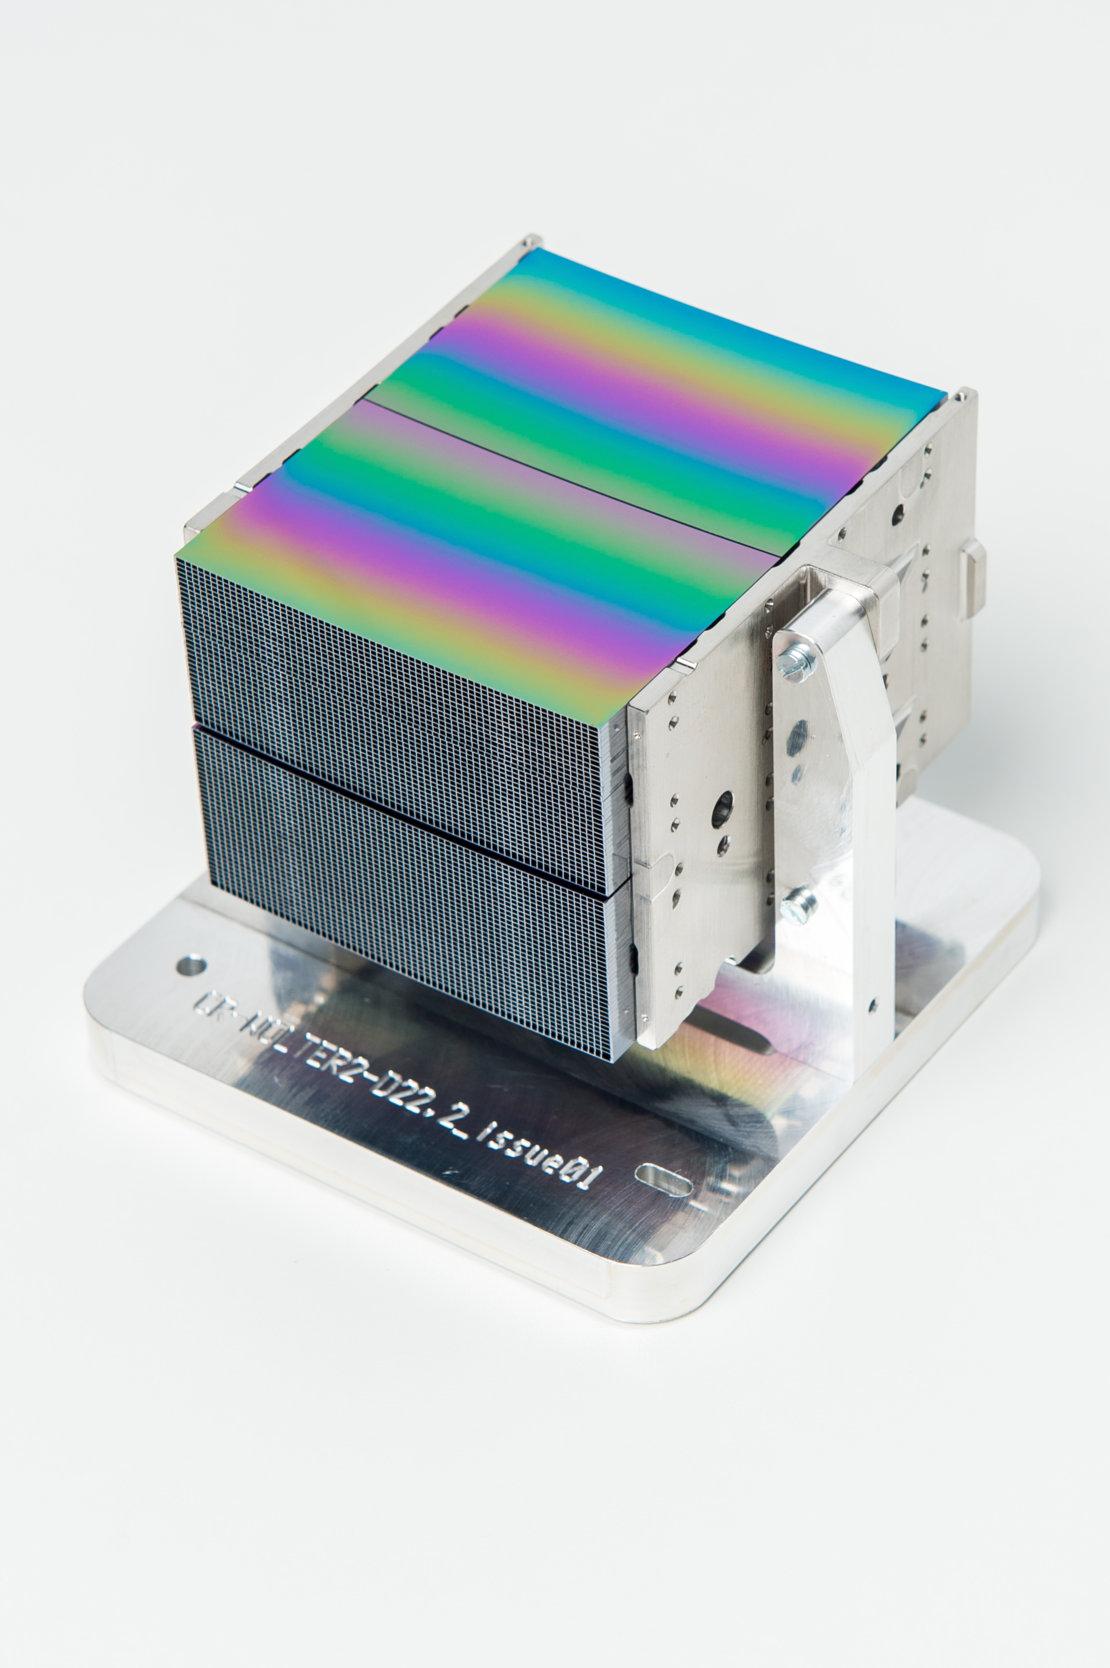 Athena mirror module / 02 / 2019 / Images / ESA Multimedia